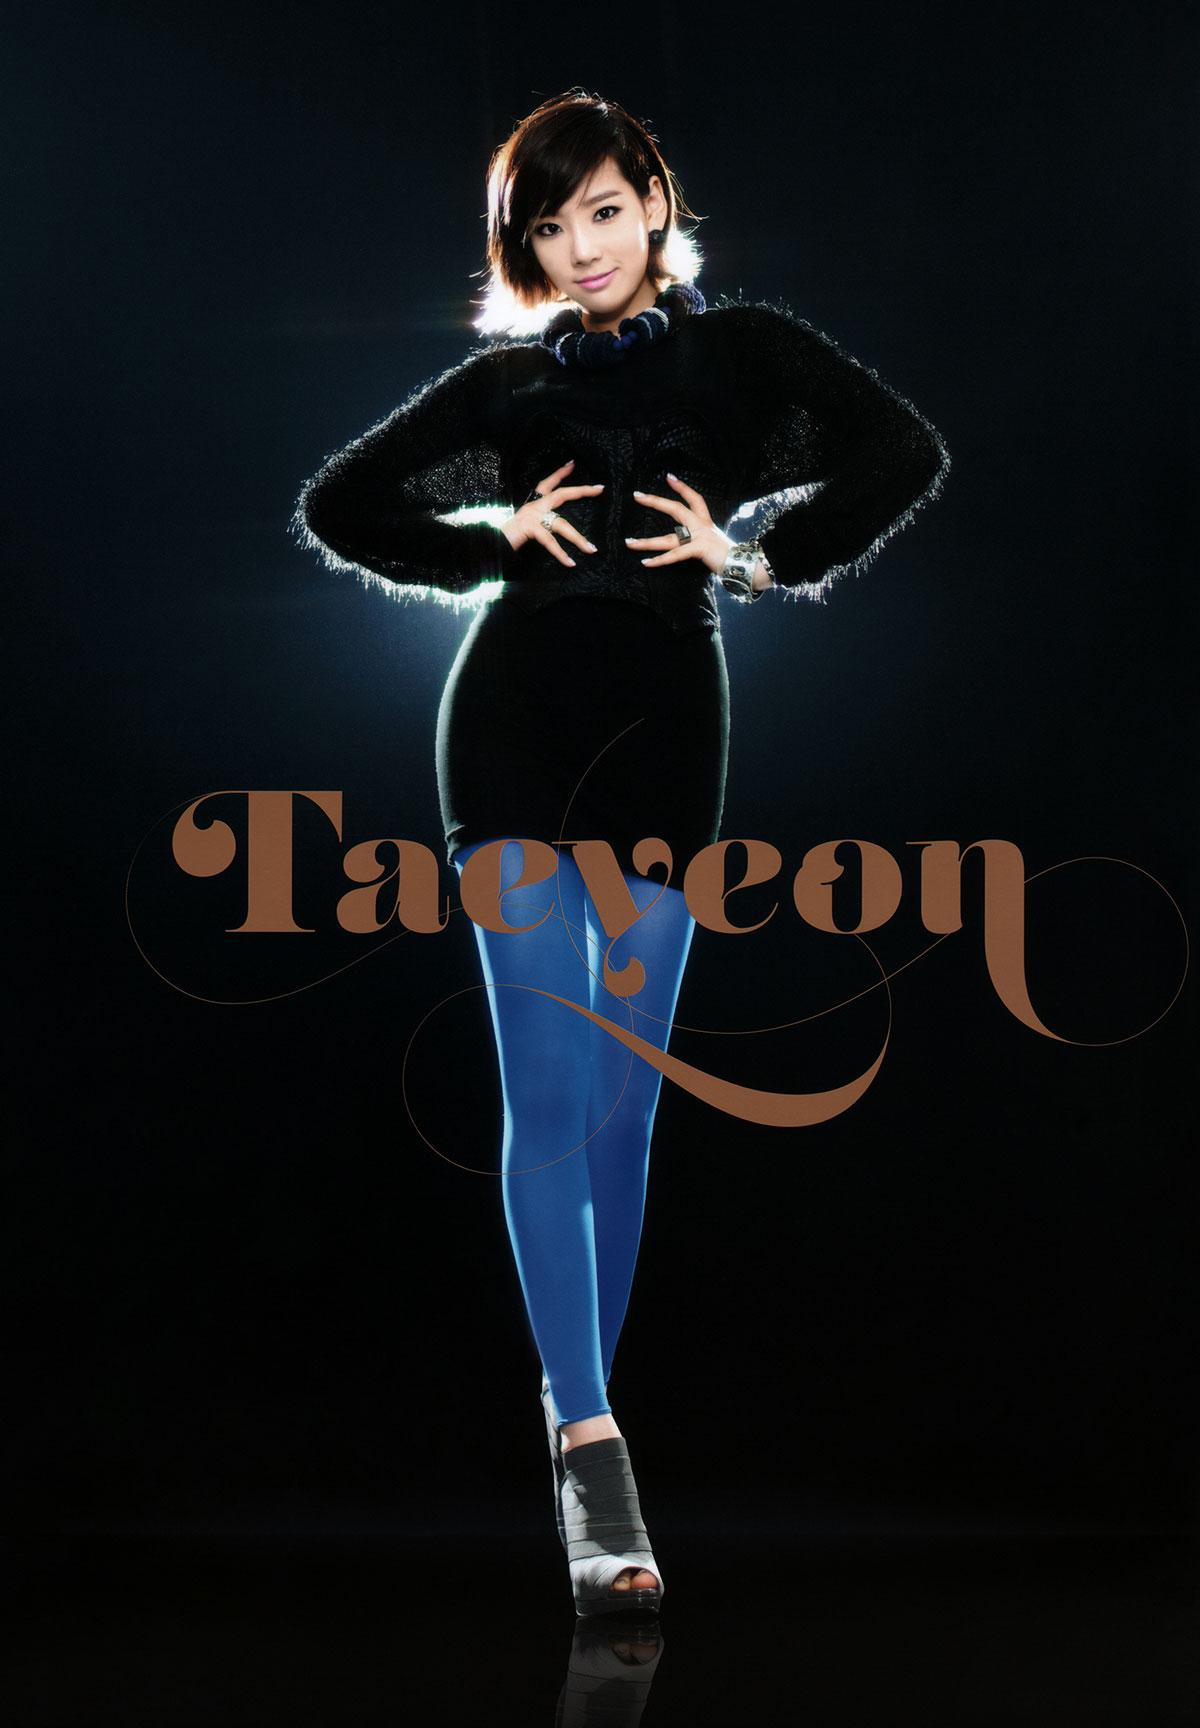 Taeyeon Girls Generation 2011 Tour brochure